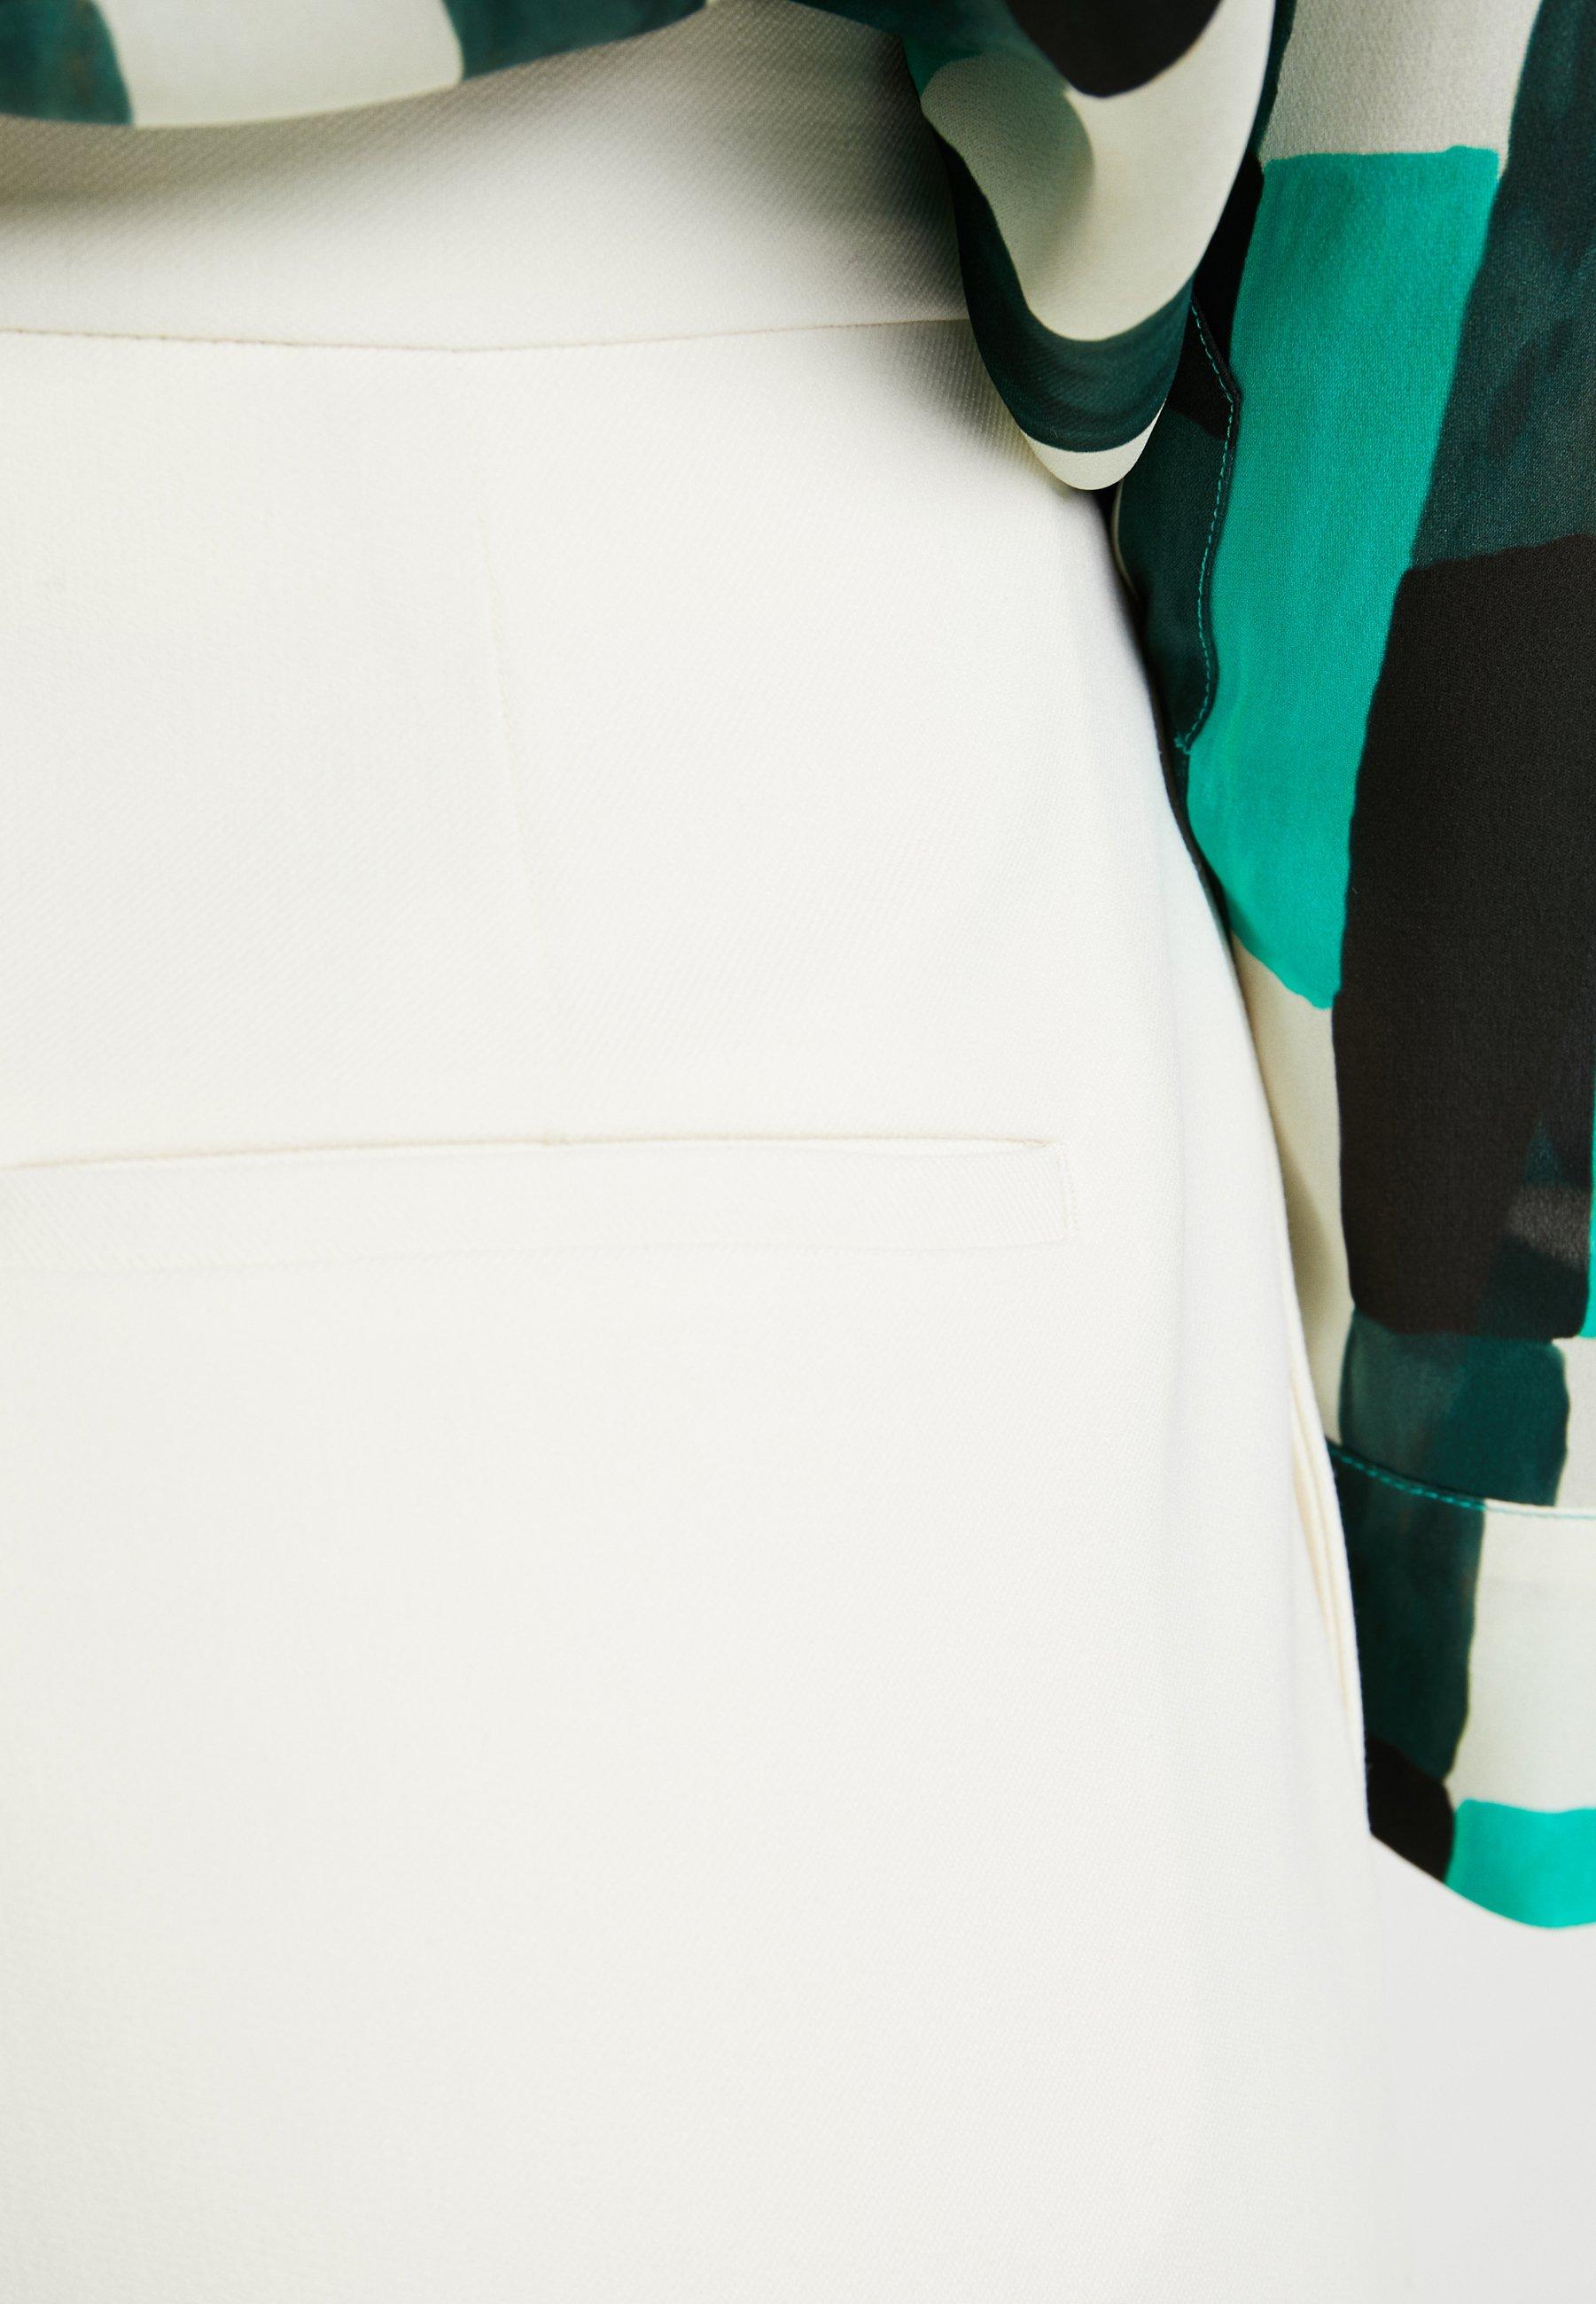 Classique TrousersPantalon White Samsøeamp; Zal Asparagus clK1FTJ3